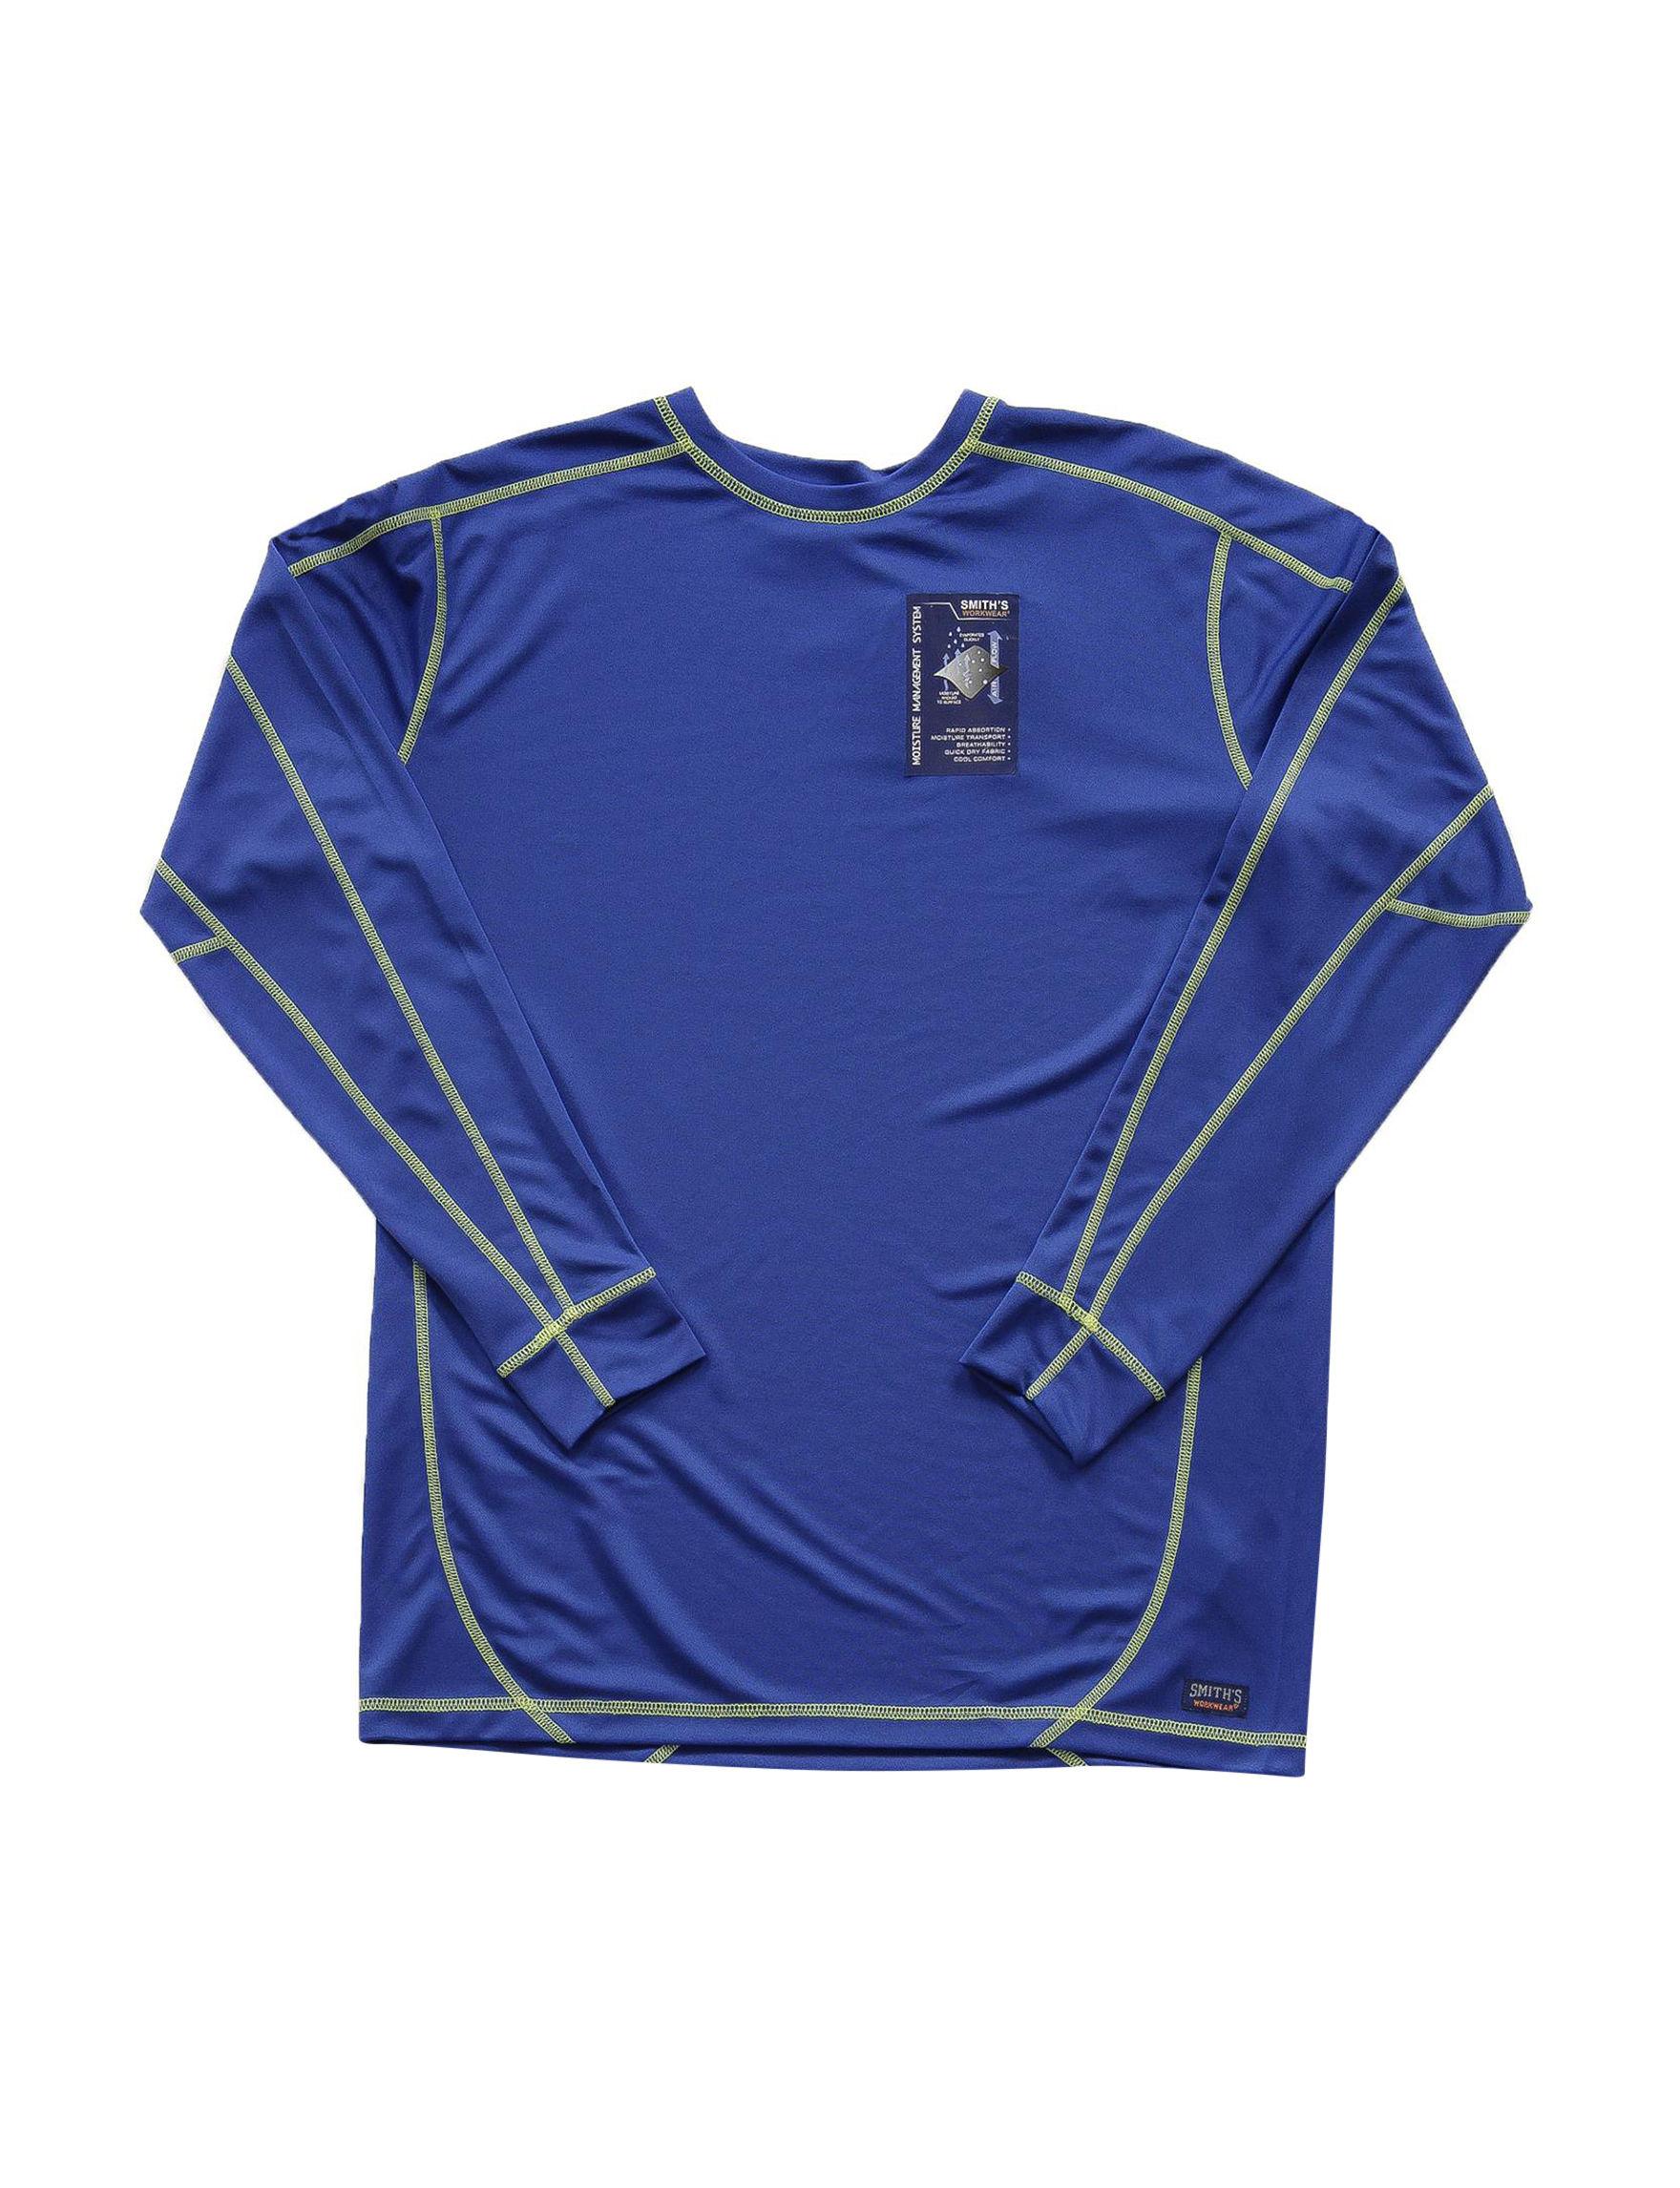 Smith's Workwear True Blue Tees & Tanks